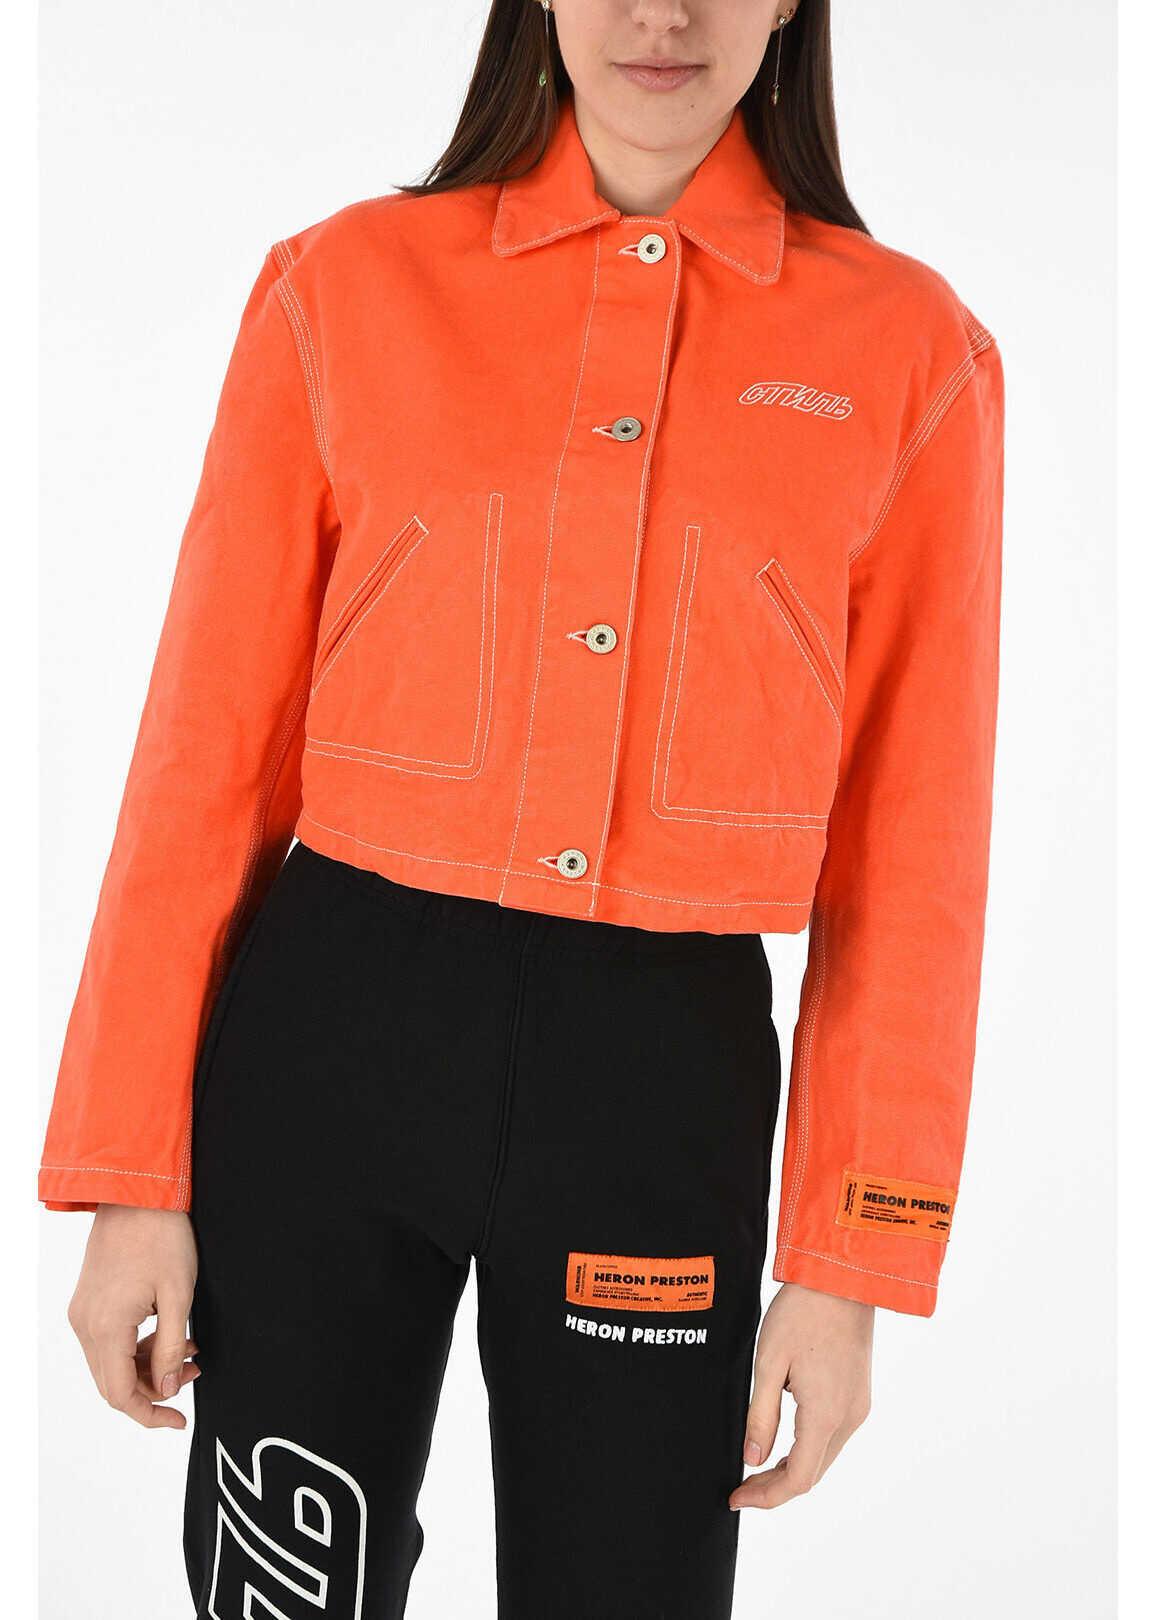 Heron Preston waist length denim jacket ORANGE